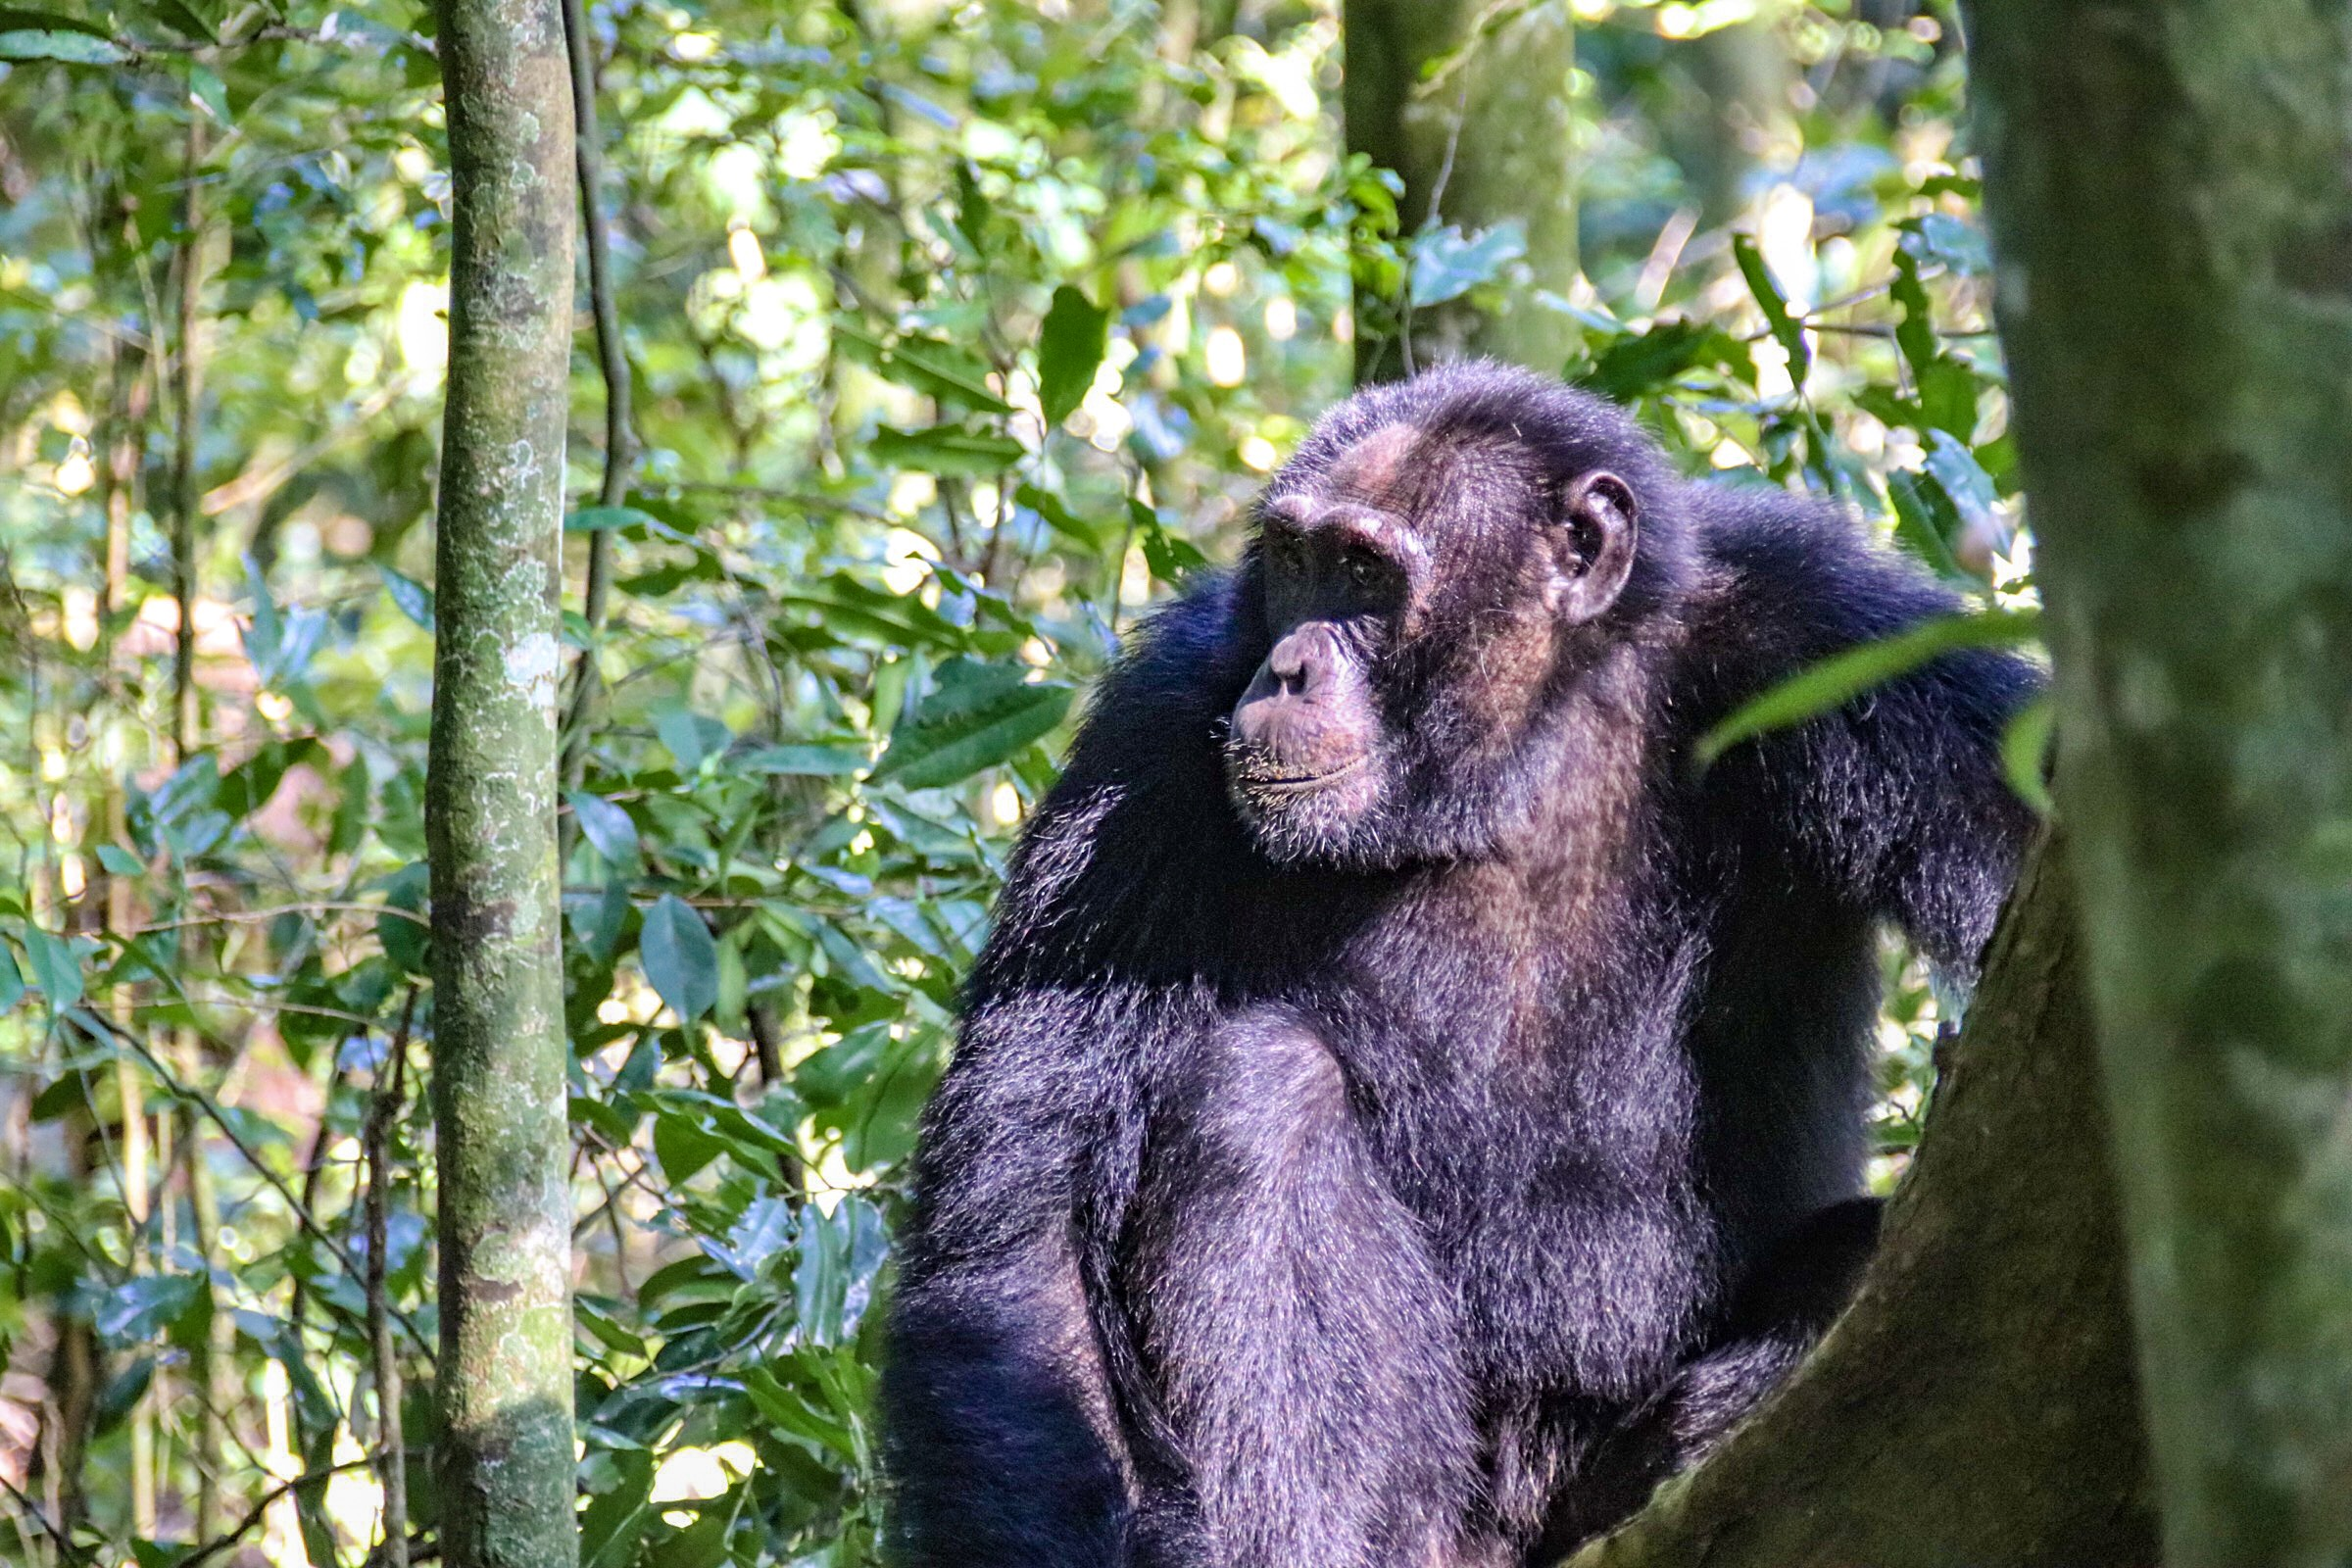 11-Day Primates and Birding Safaris in Uganda - The Pearl of Africa 2